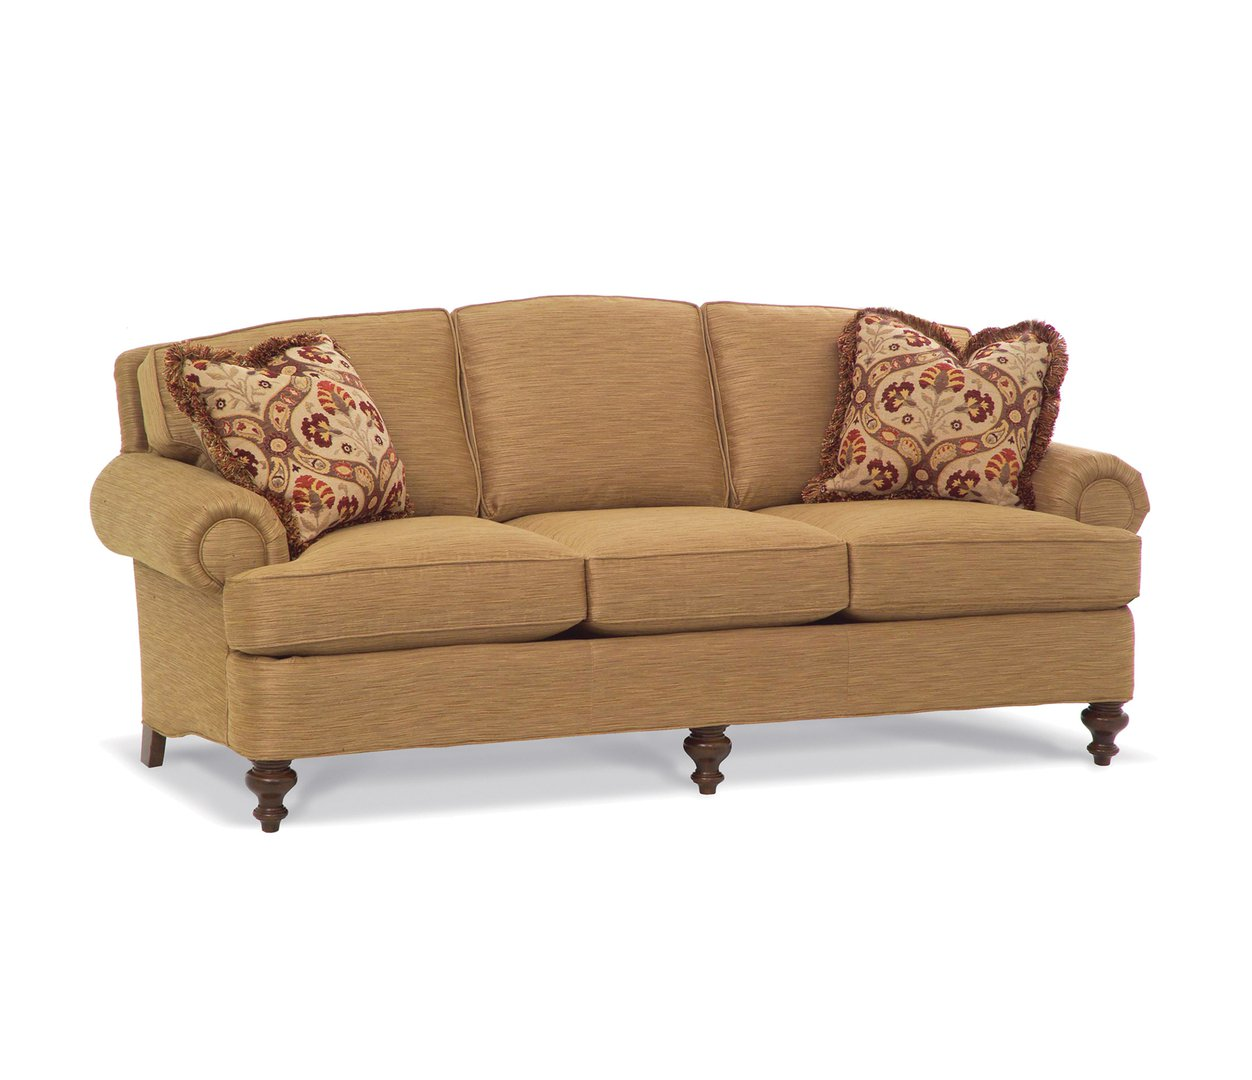 Skyy Sofa Image